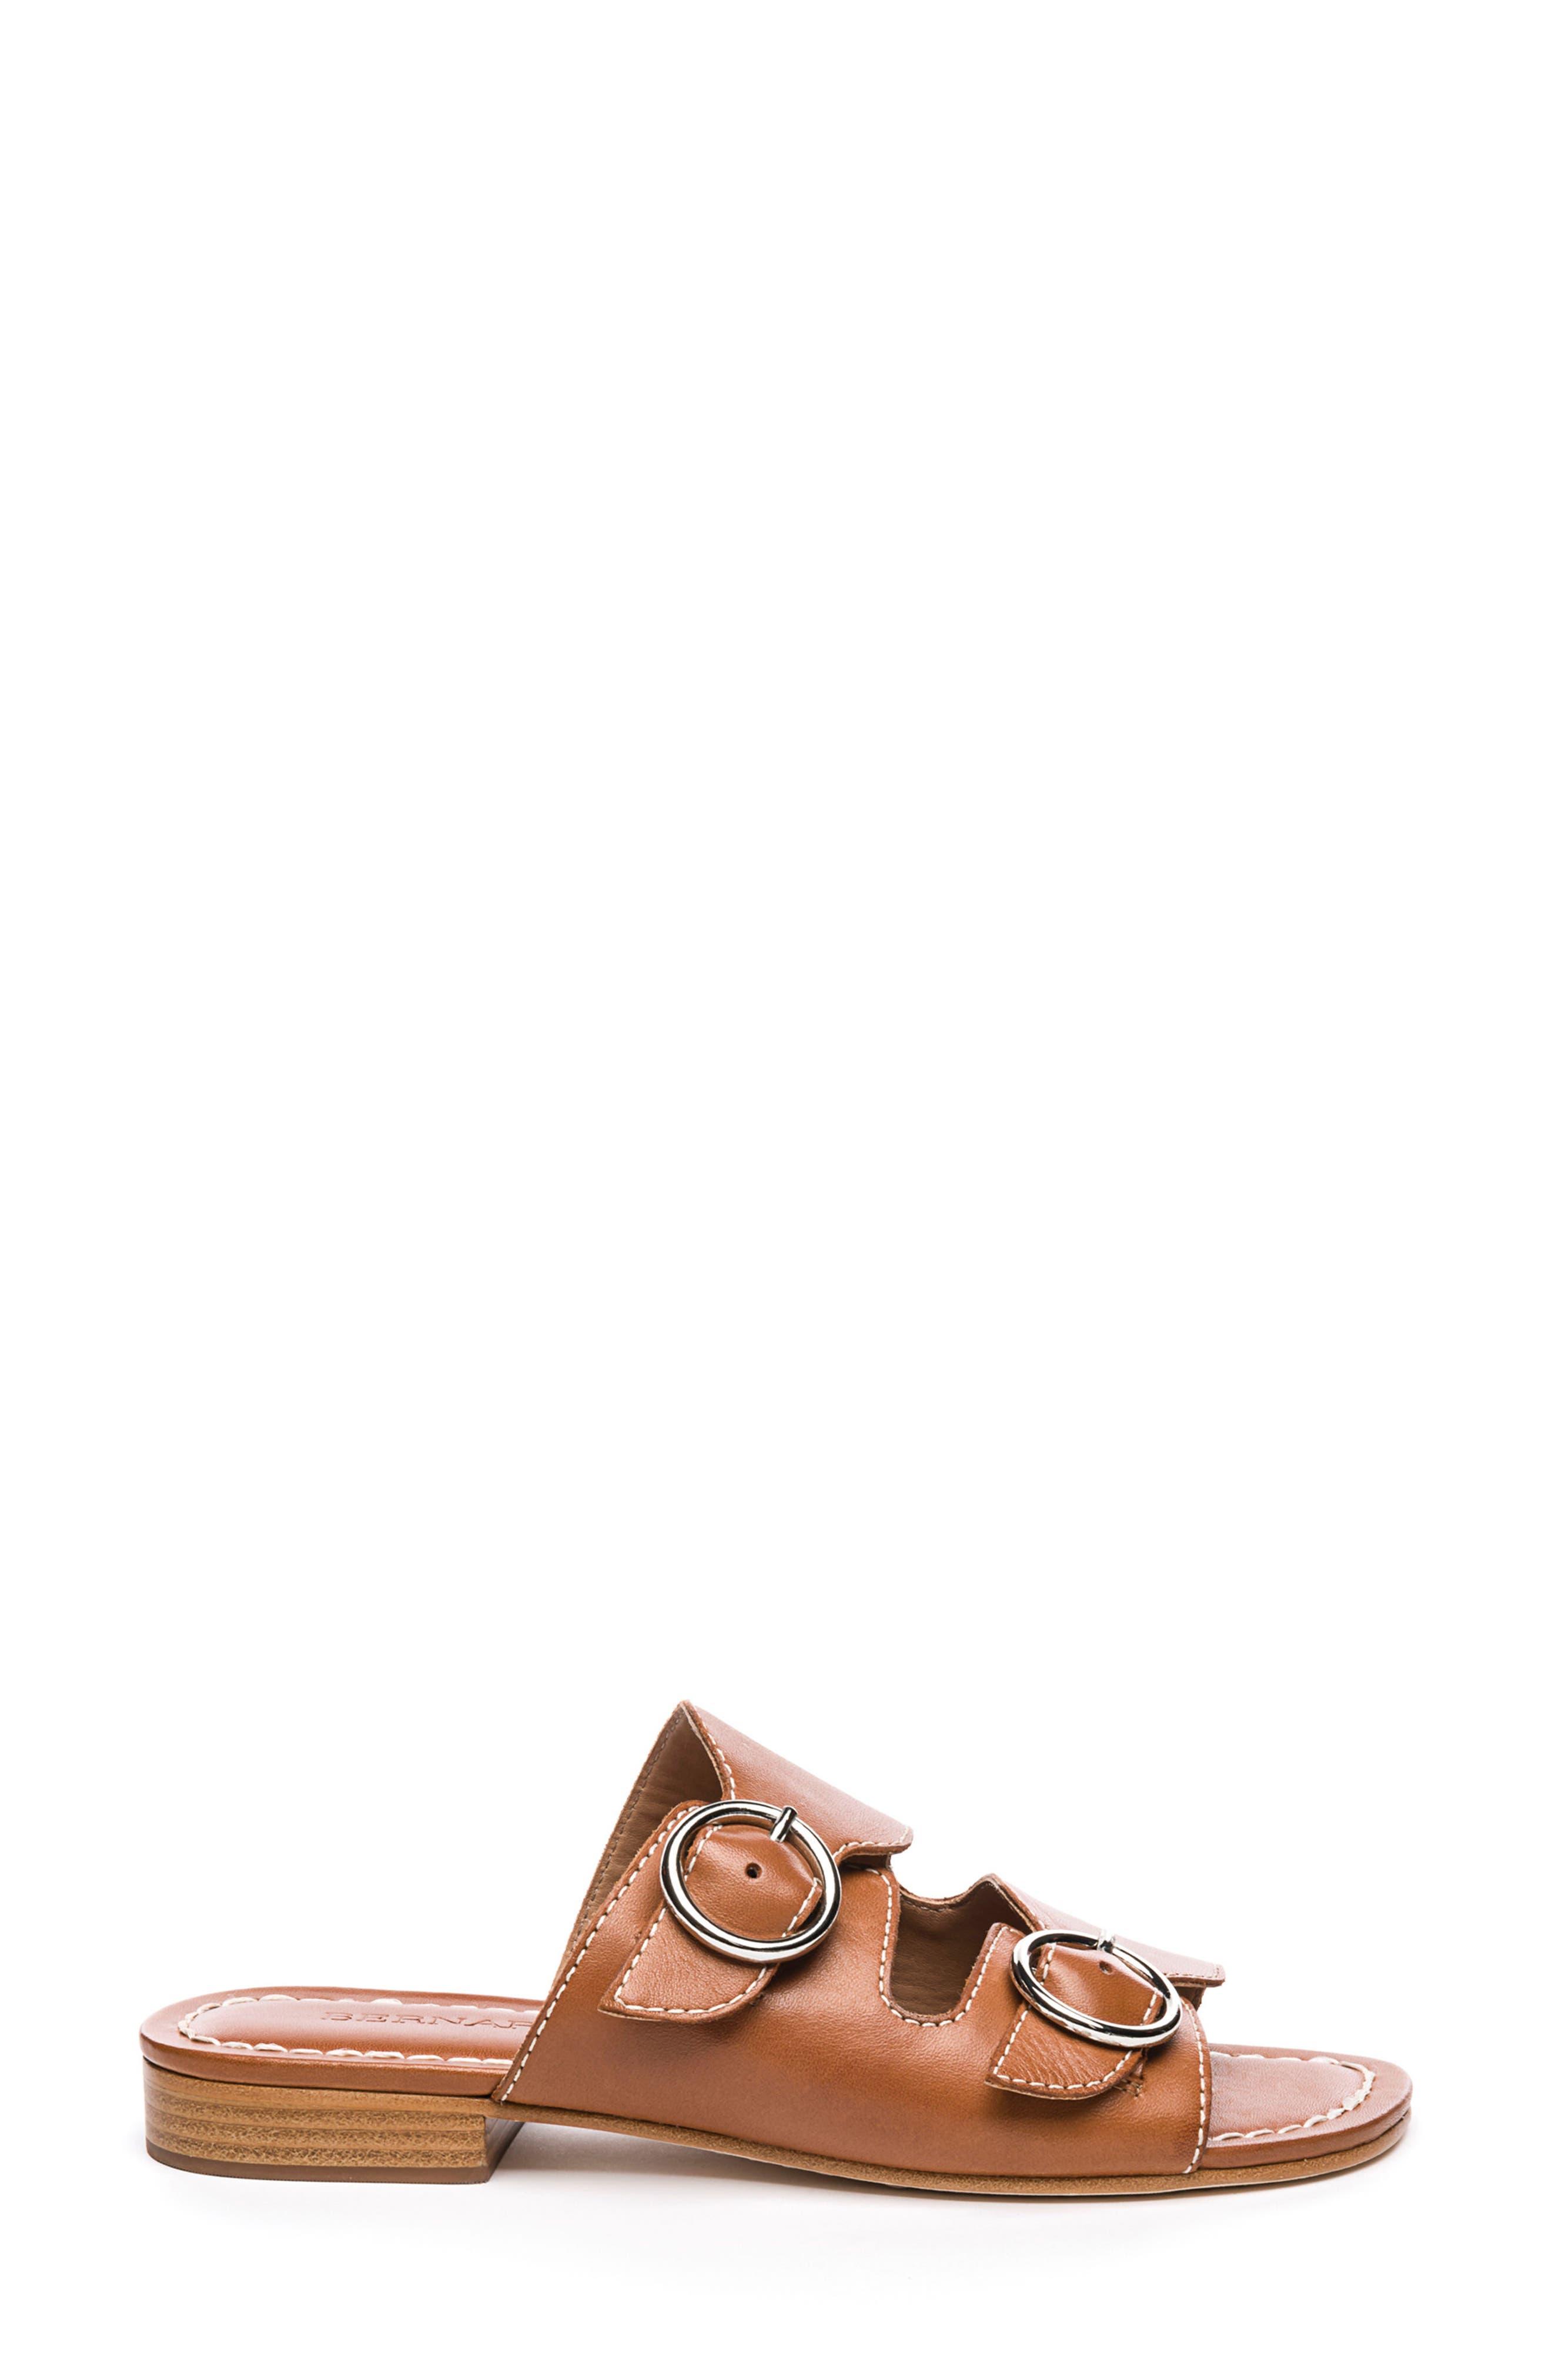 Bernardo Tobi Slide Sandal,                             Alternate thumbnail 3, color,                             Luggage Leather